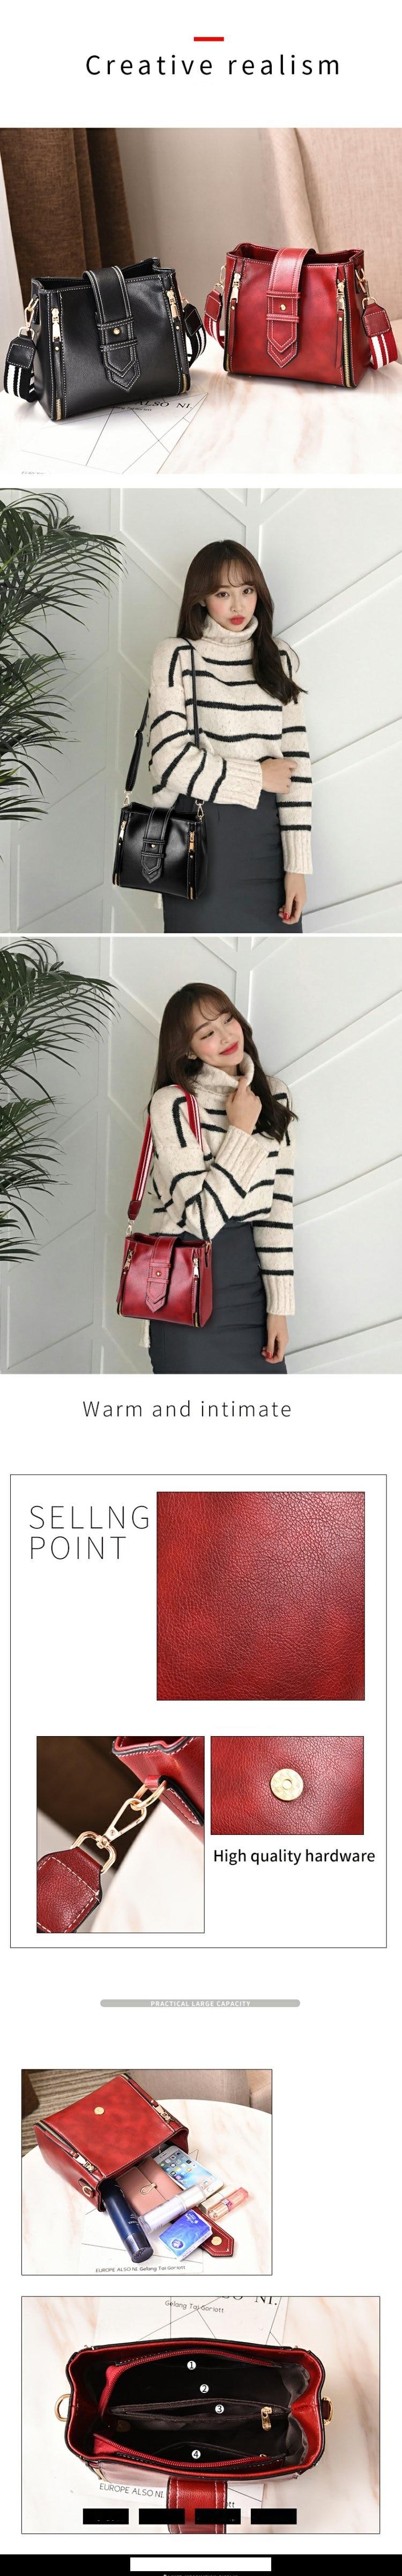 WERAIMJX Mode Tas untuk Wanita 2018 wanita yang Murah Tas Flap Zipper Bahu Tas Bolsos Mujer Utusan Tas untuk Wanita MJ232